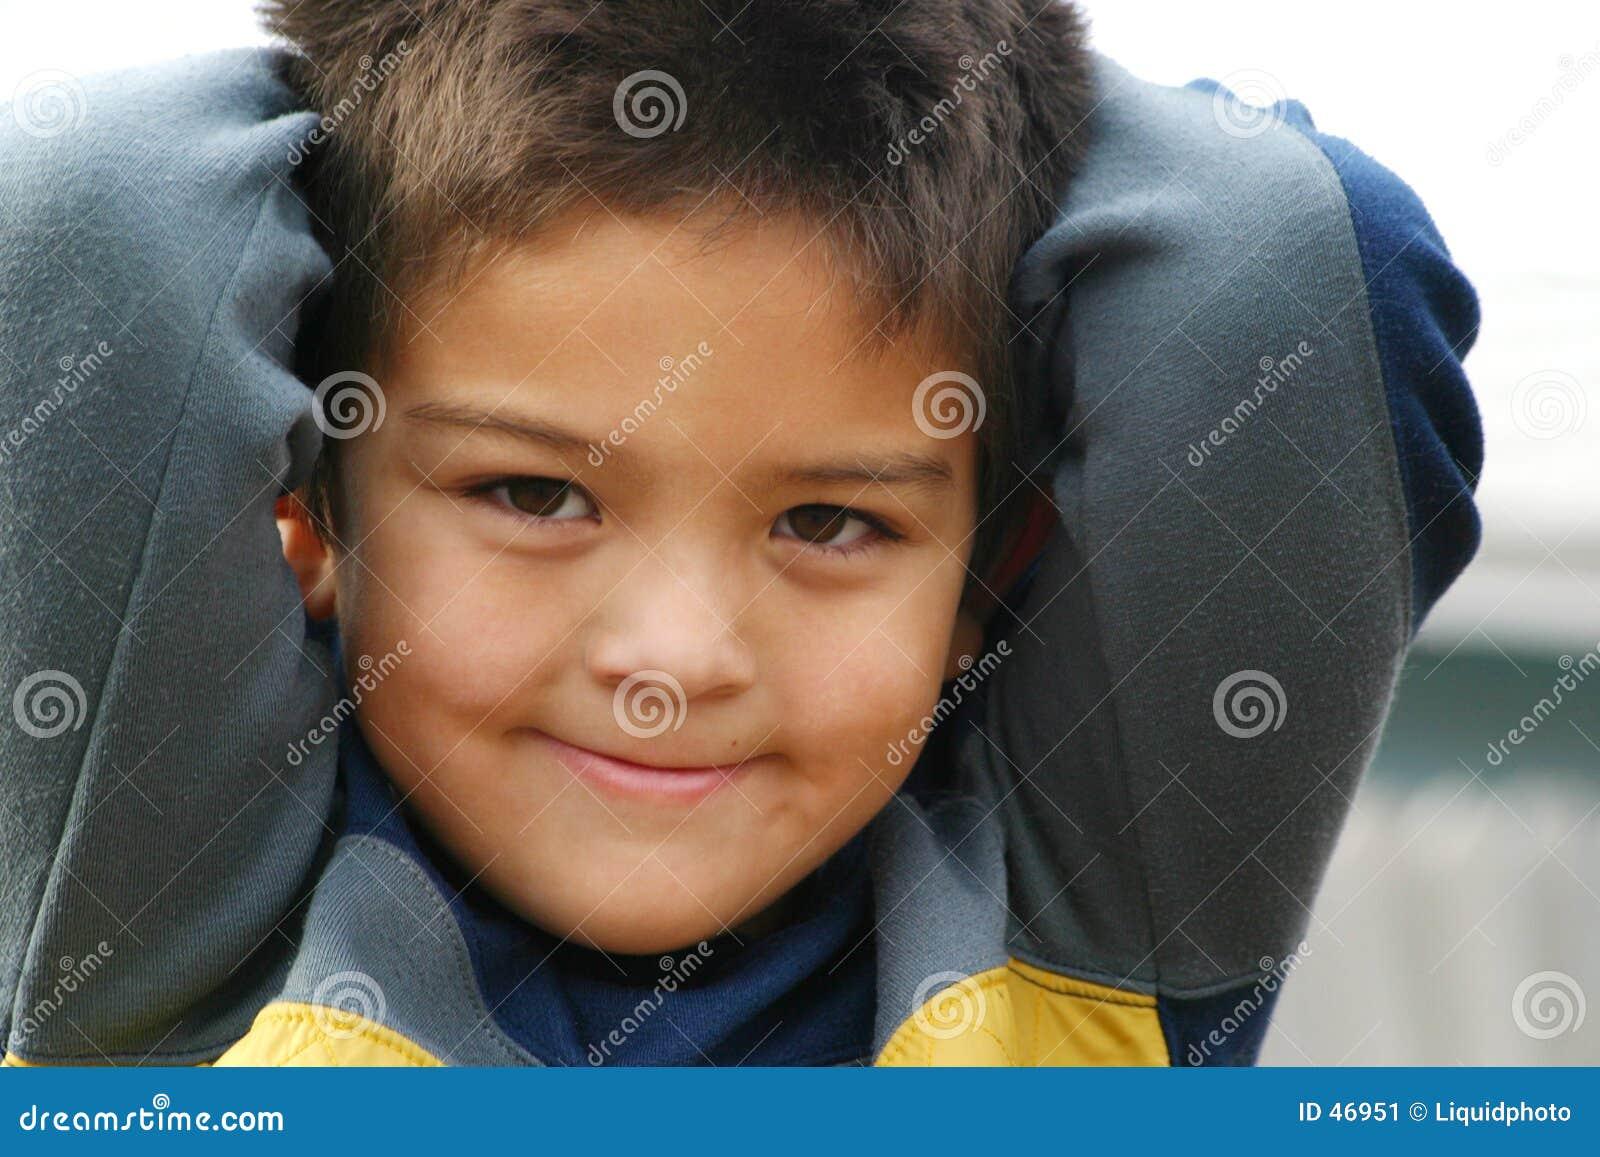 Young Boy Smiles